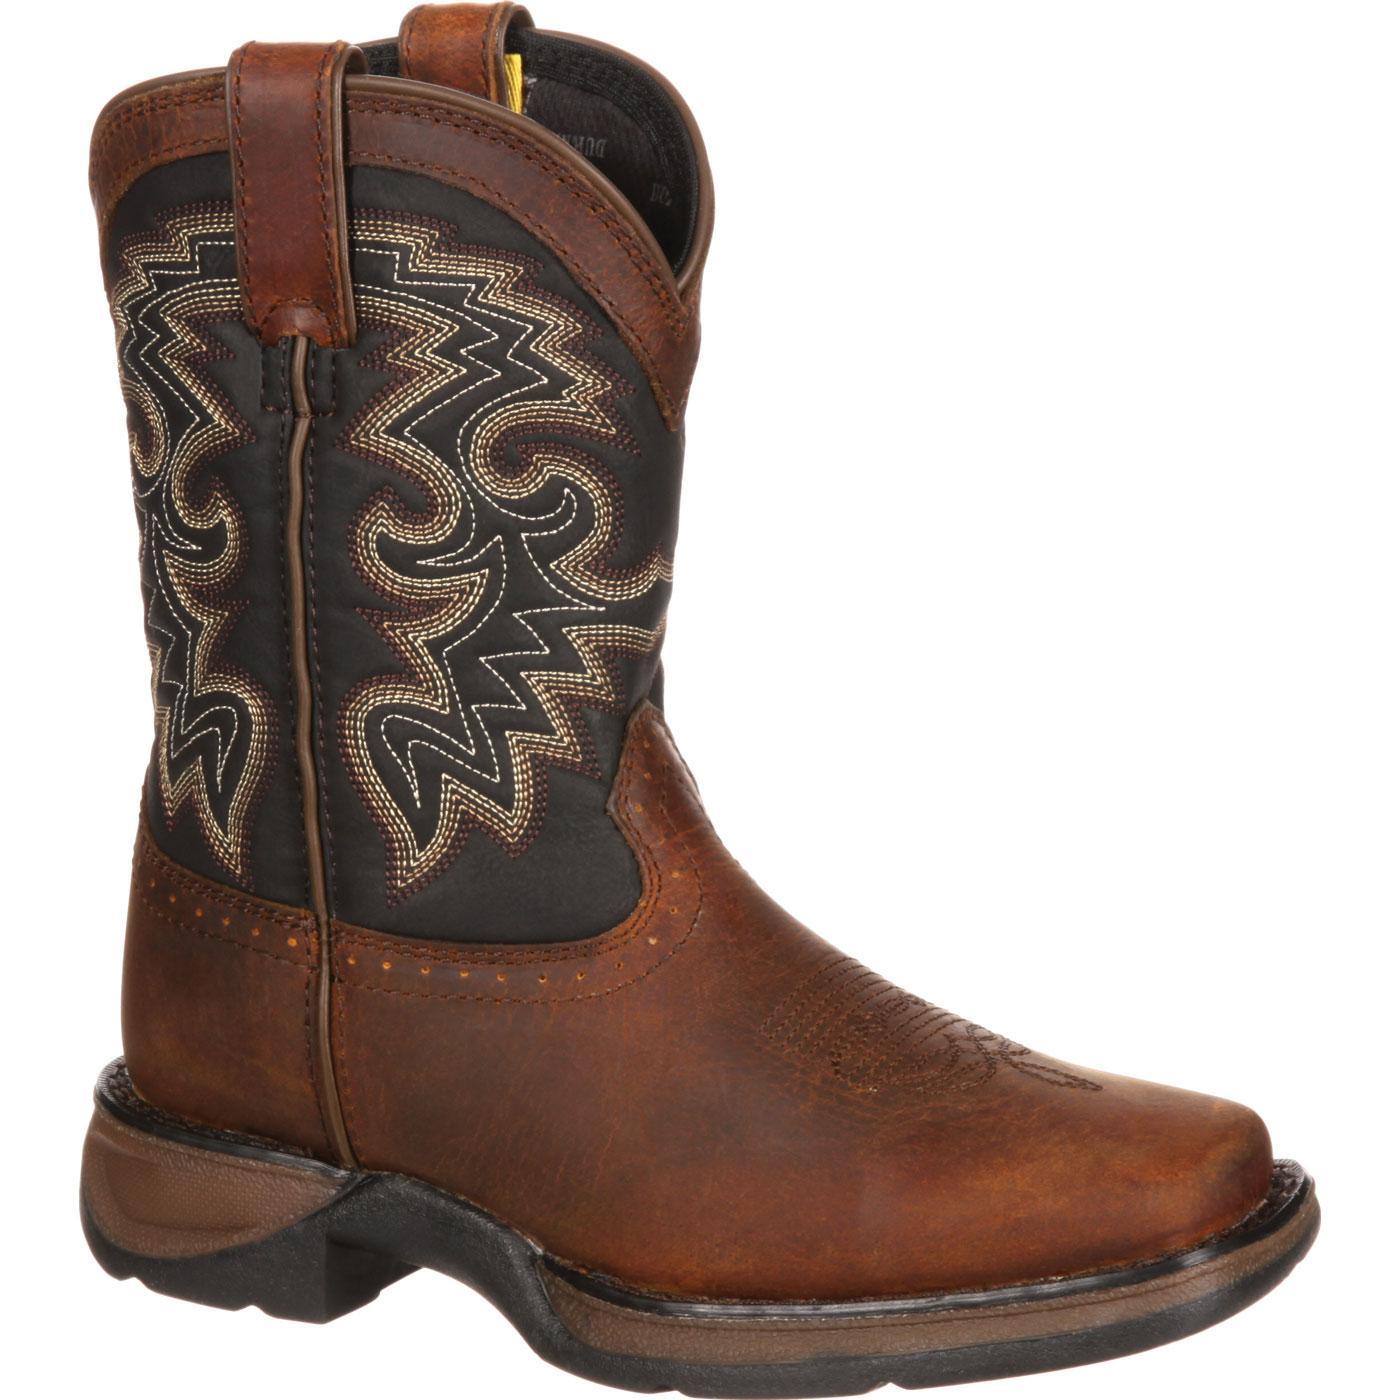 Lil' Durango Little Kid Western Boot, #DWBT049